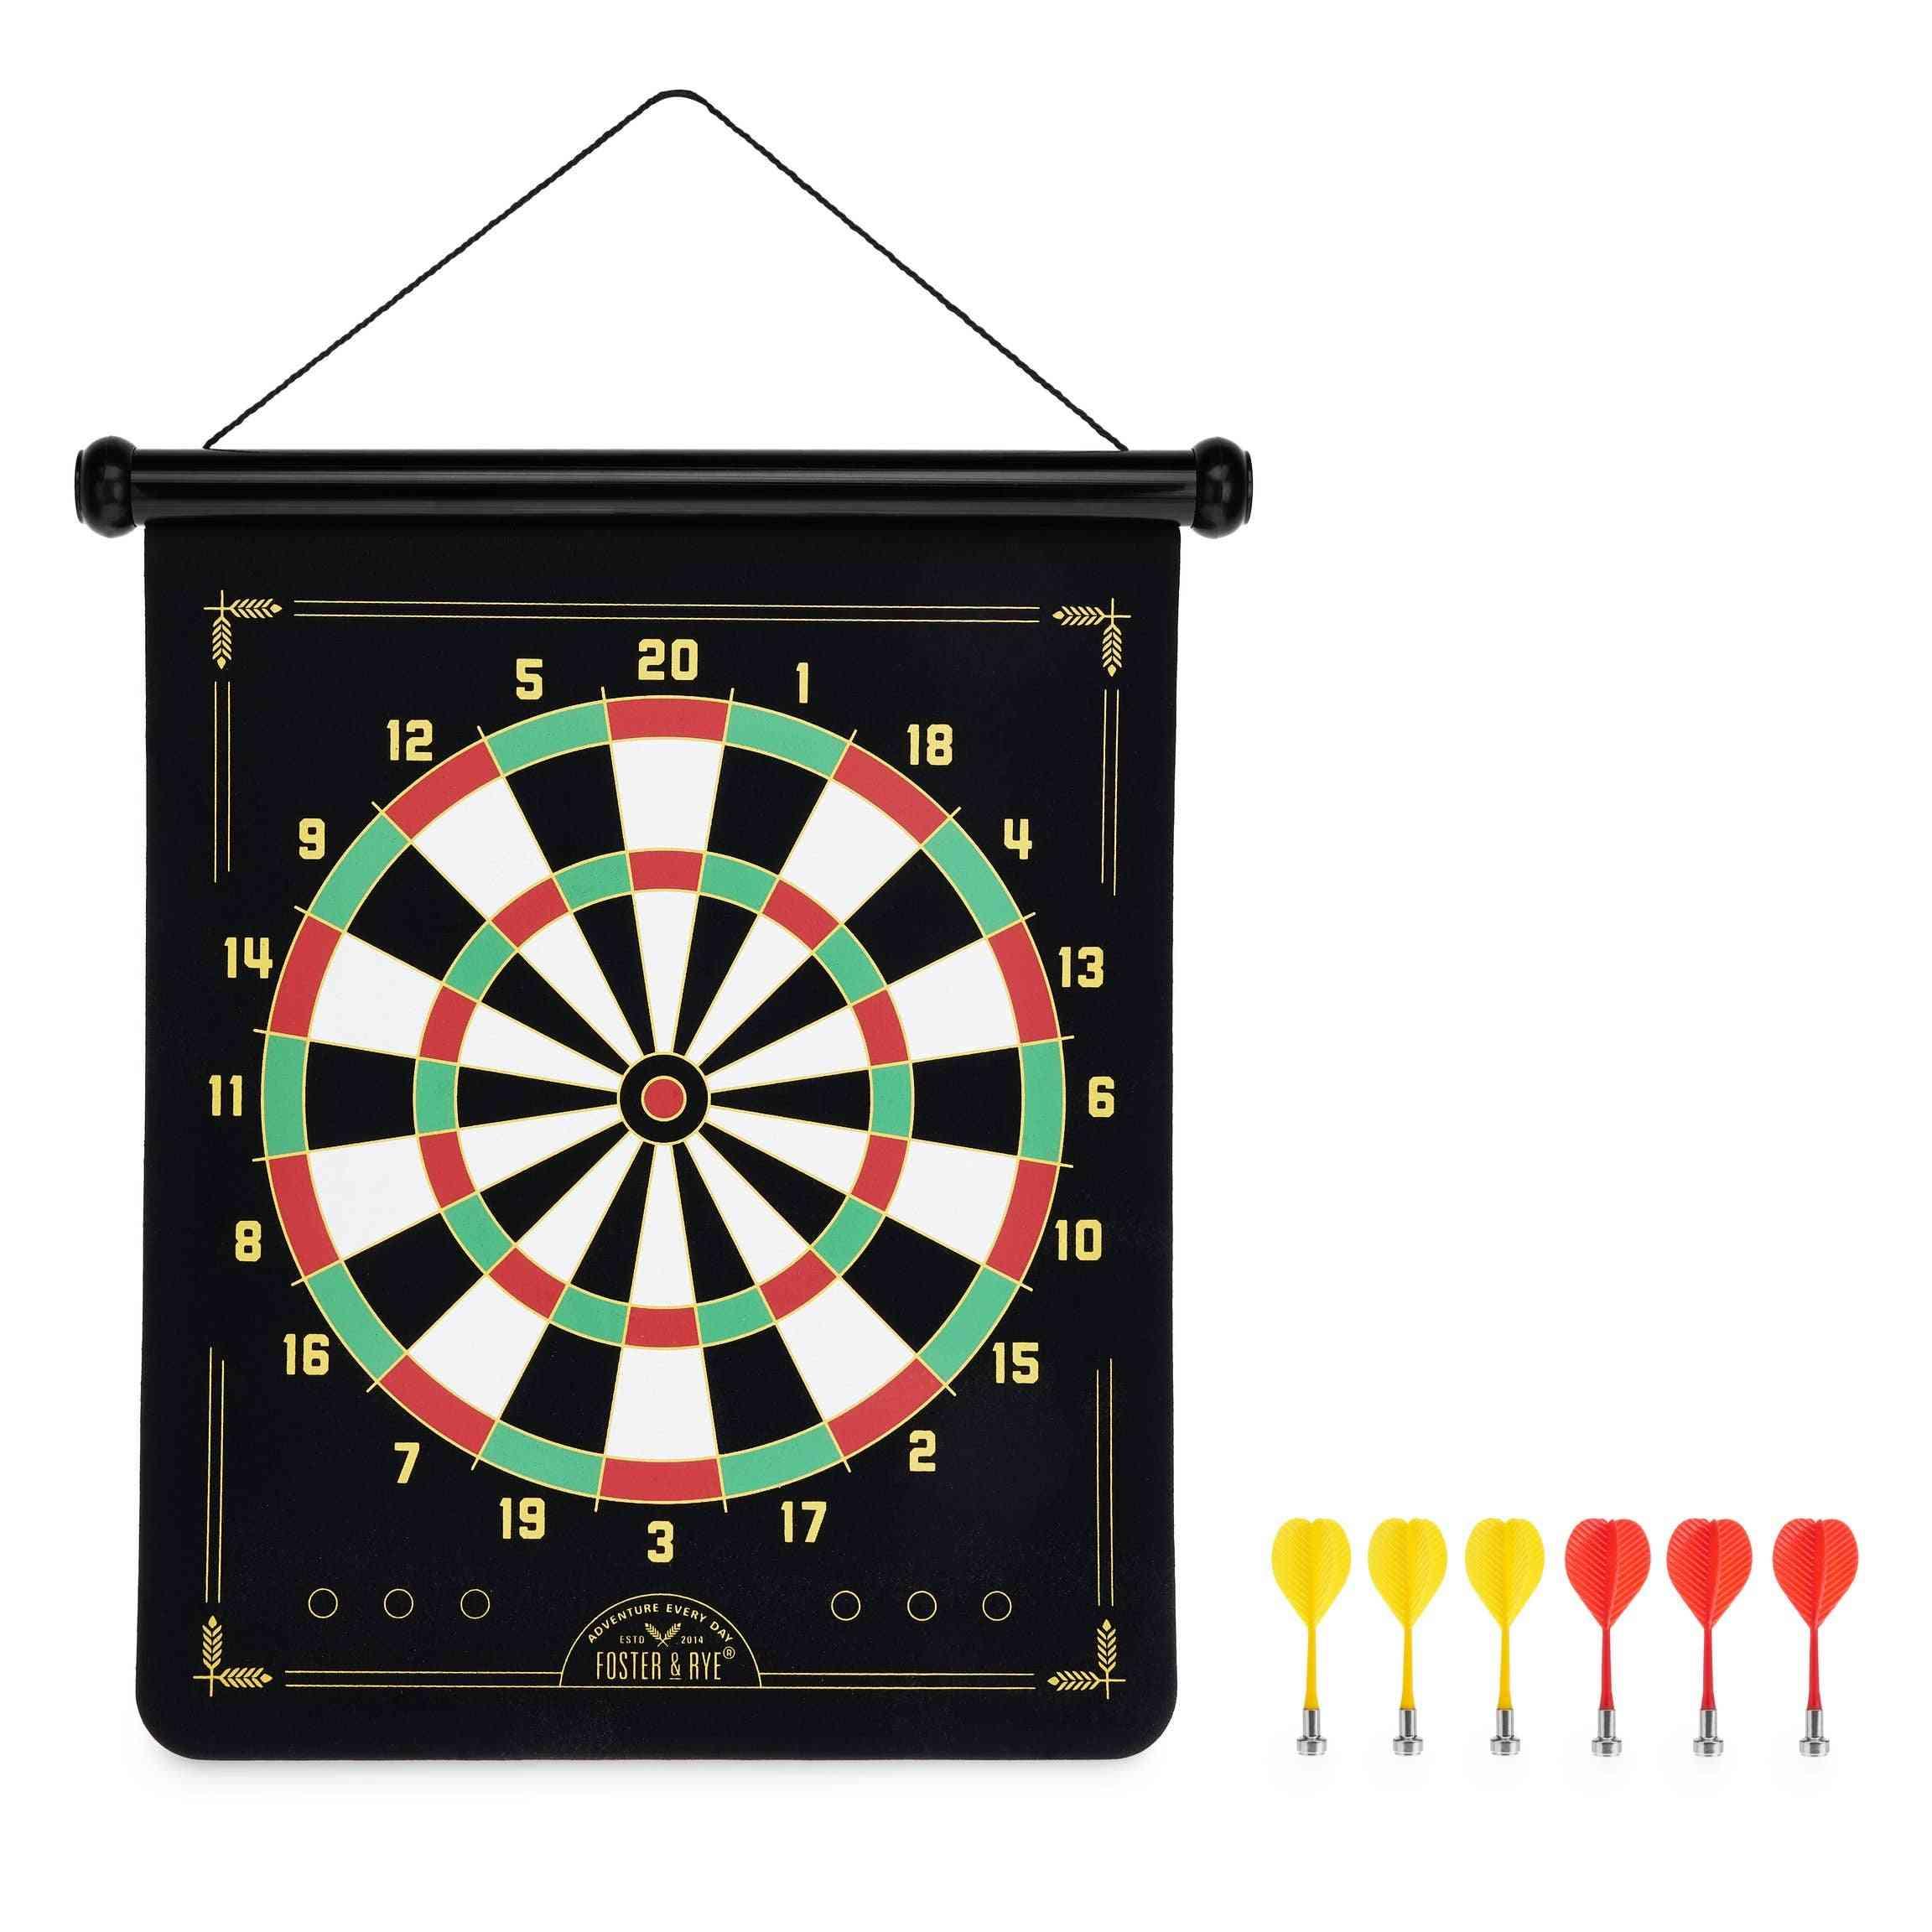 Magnetic Dart Board, Traditional & Bullseye Game Included